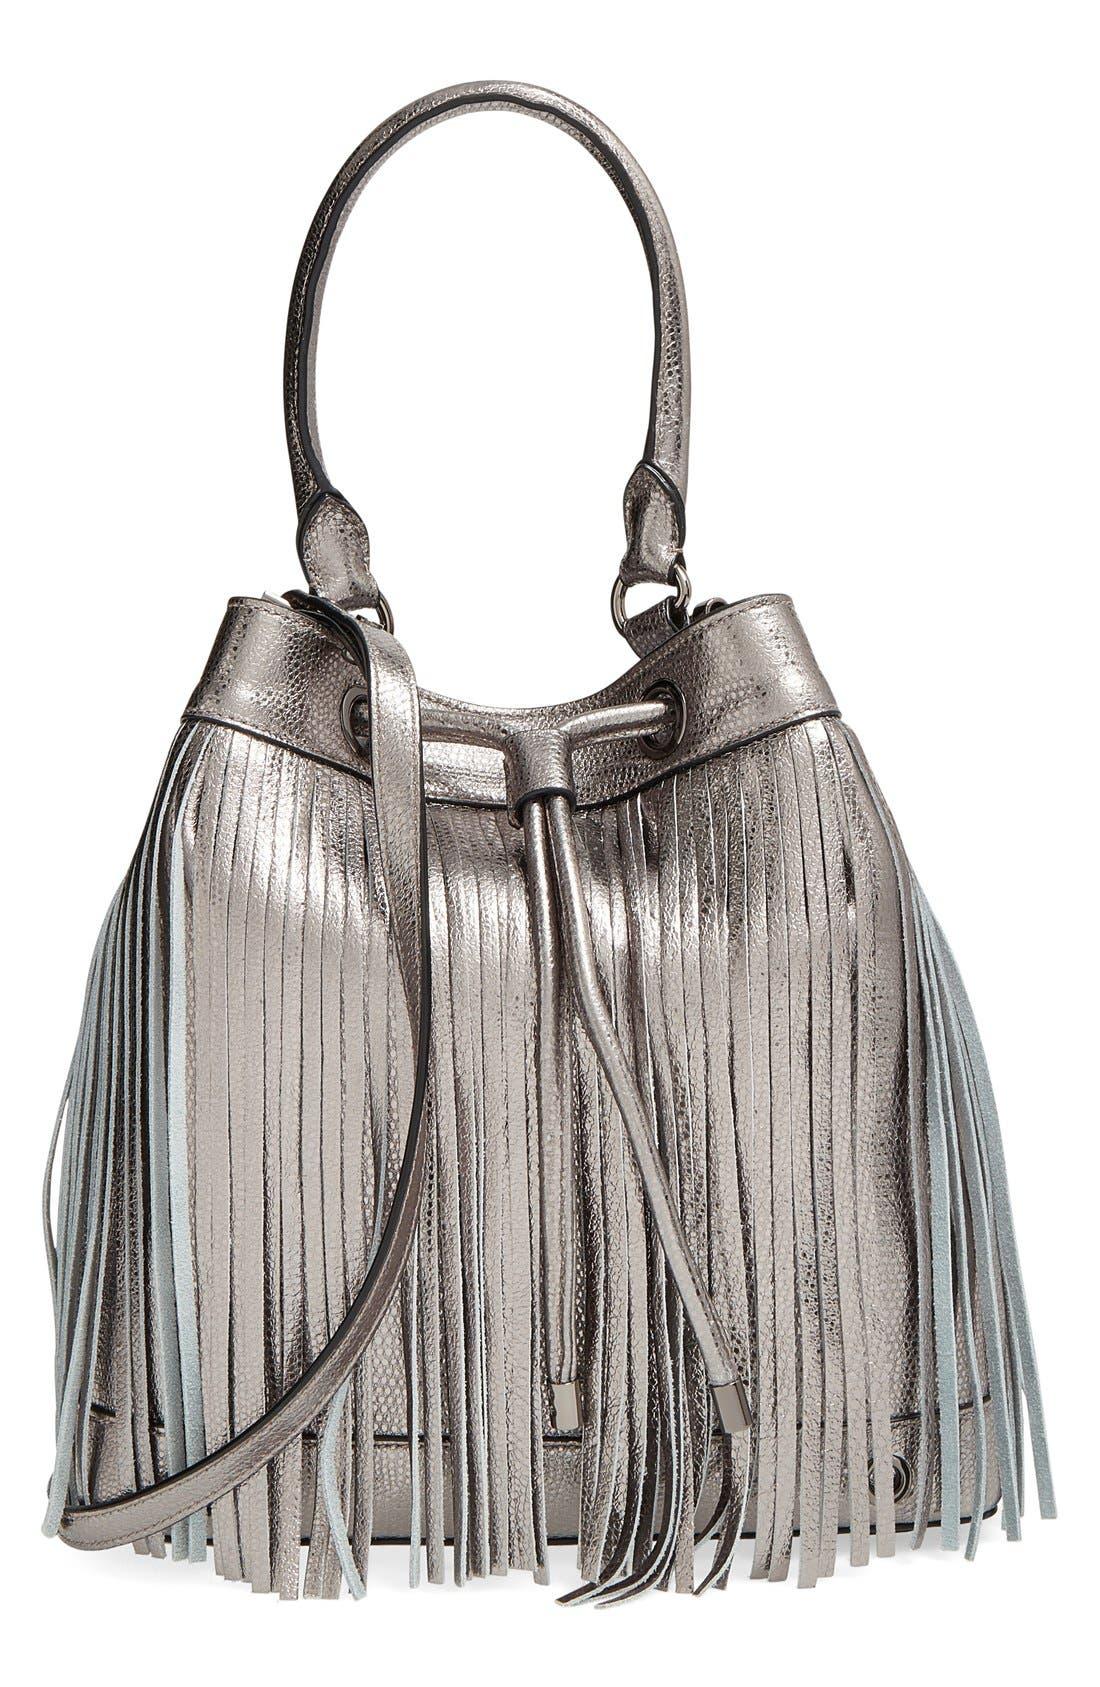 Alternate Image 1 Selected - Milly 'Large' Metallic Leather Fringe Bucket Bag